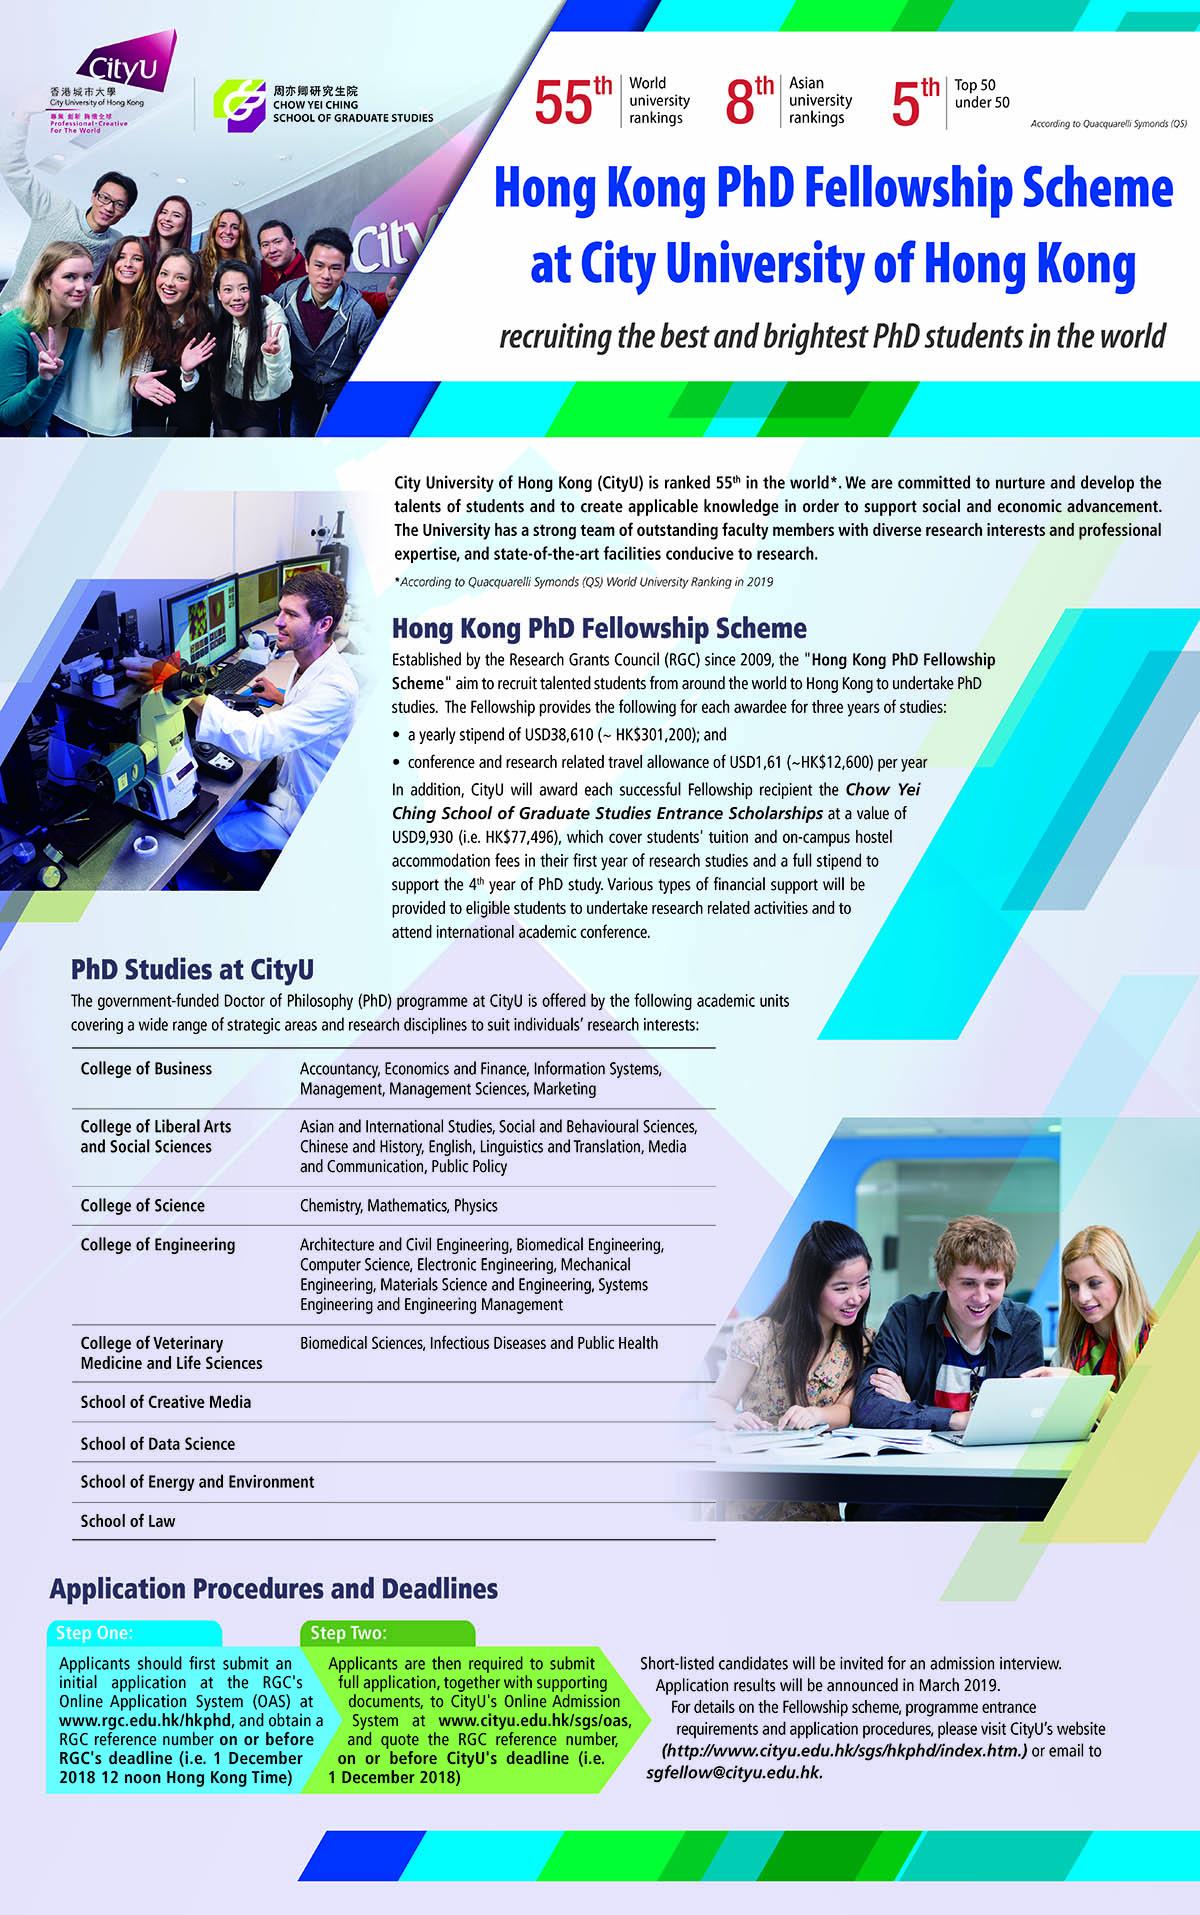 HKPFS advertisement